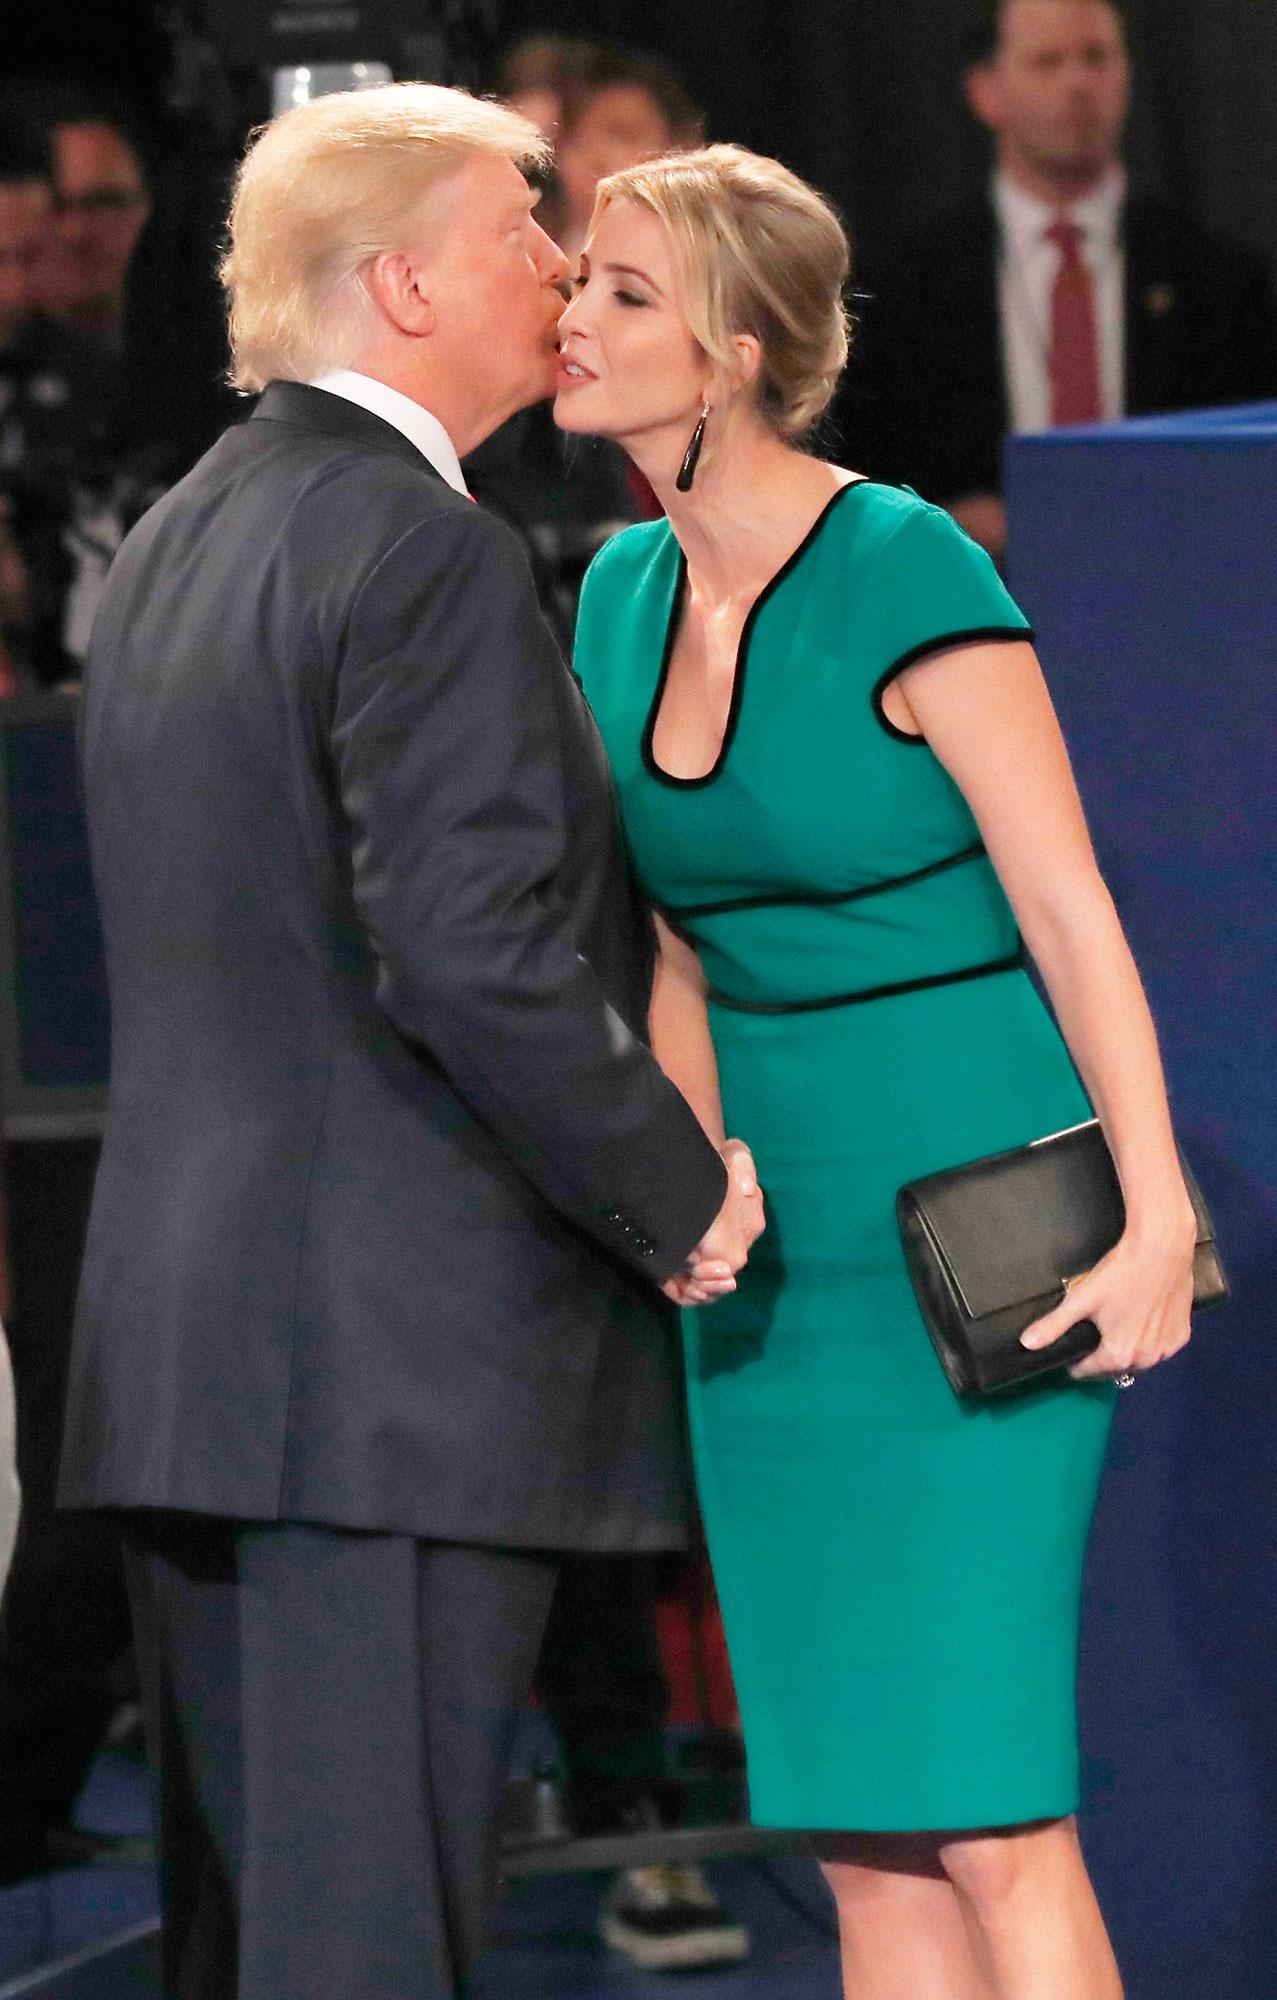 Ivanka Trump\'s Green Dress at Presidential Debate: Details